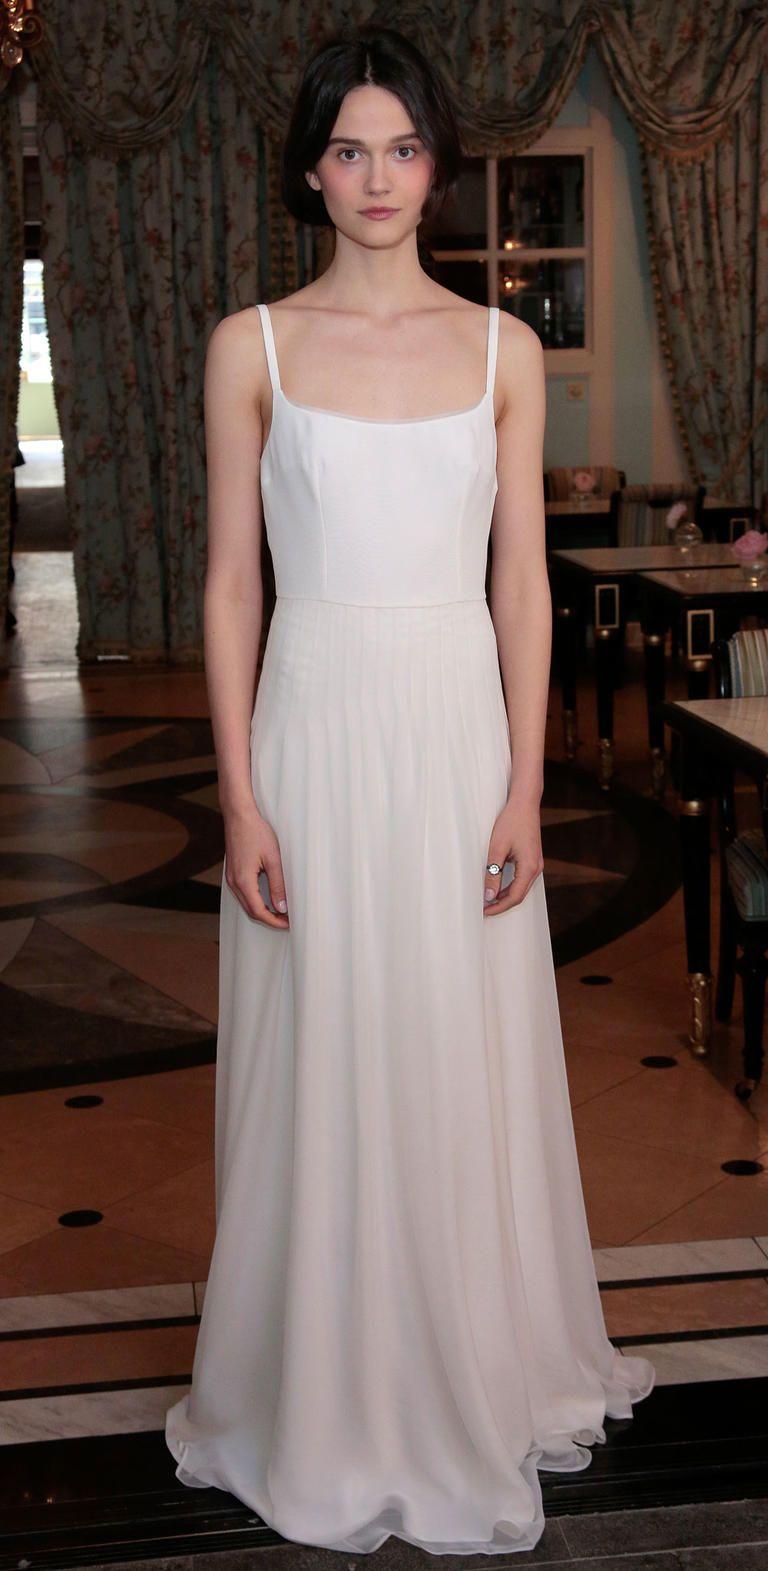 Delphine manivetus flowy spring wedding dresses are everything